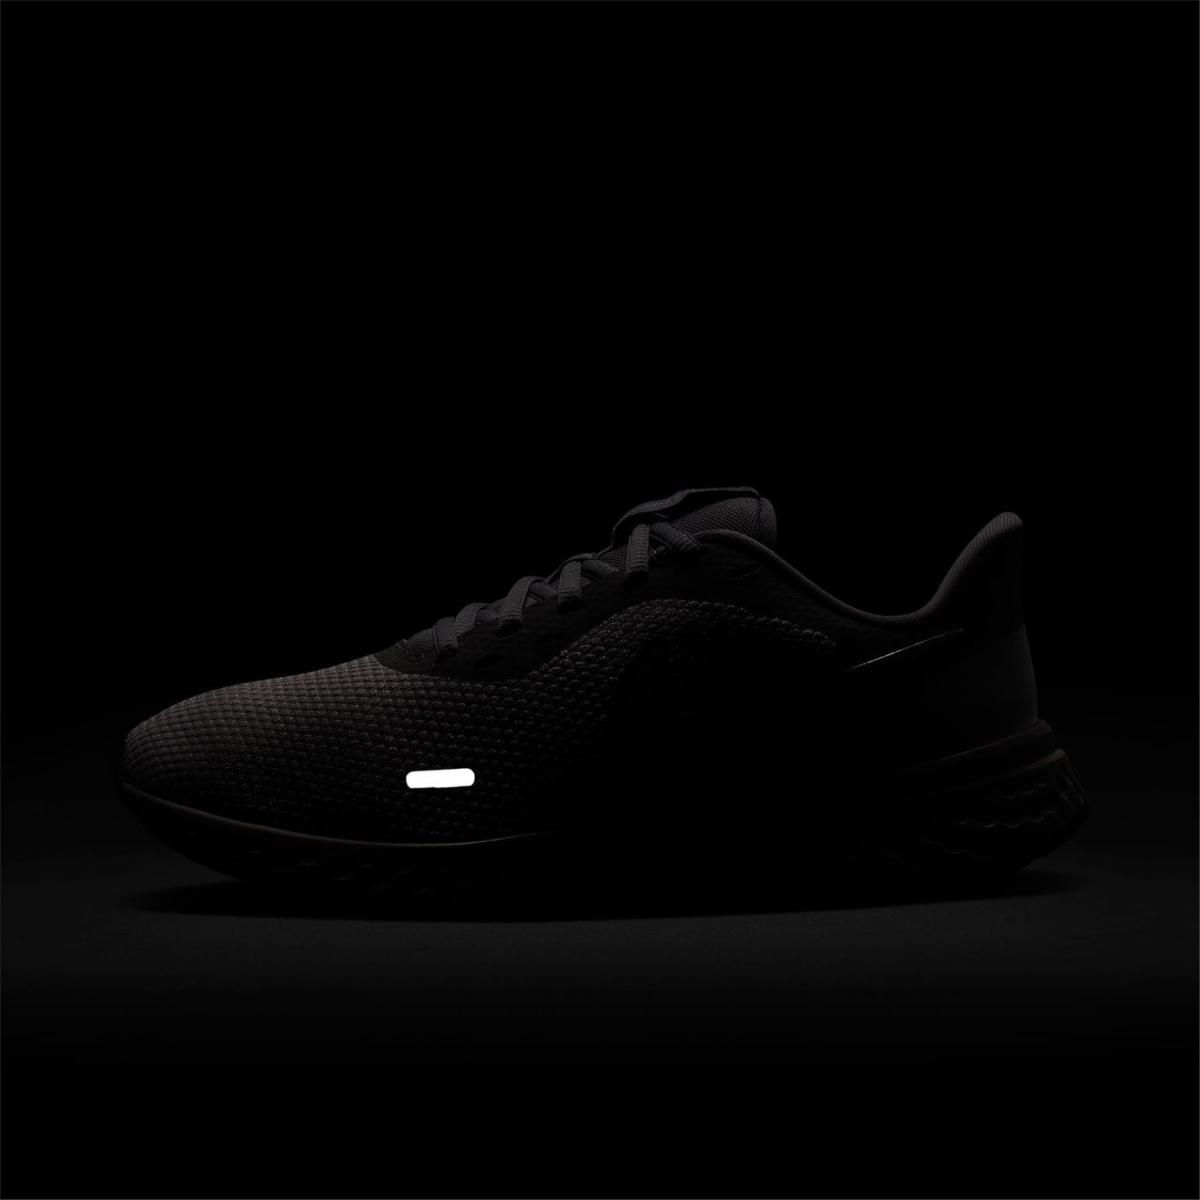 Nike-Revolution-Turnschuhe-Damen-Sneaker-Sportschuhe-Laufschuhe-1160 Indexbild 20